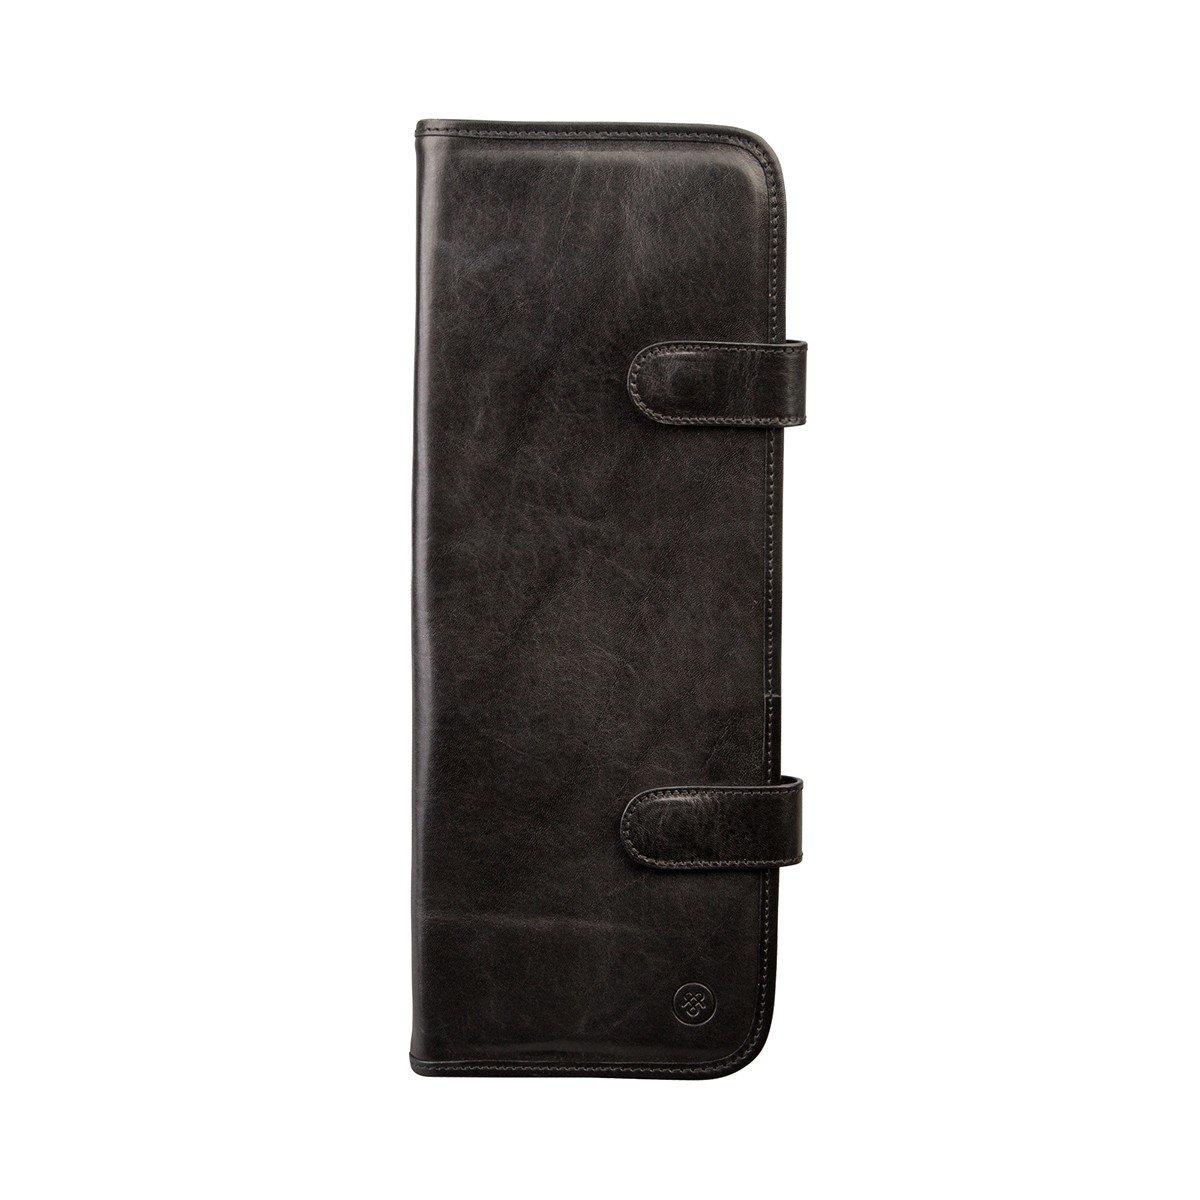 Maxwell Scott Luxury Italian Leather Tie Travel Case, Night Black (Tivoli) by Maxwell Scott Bags